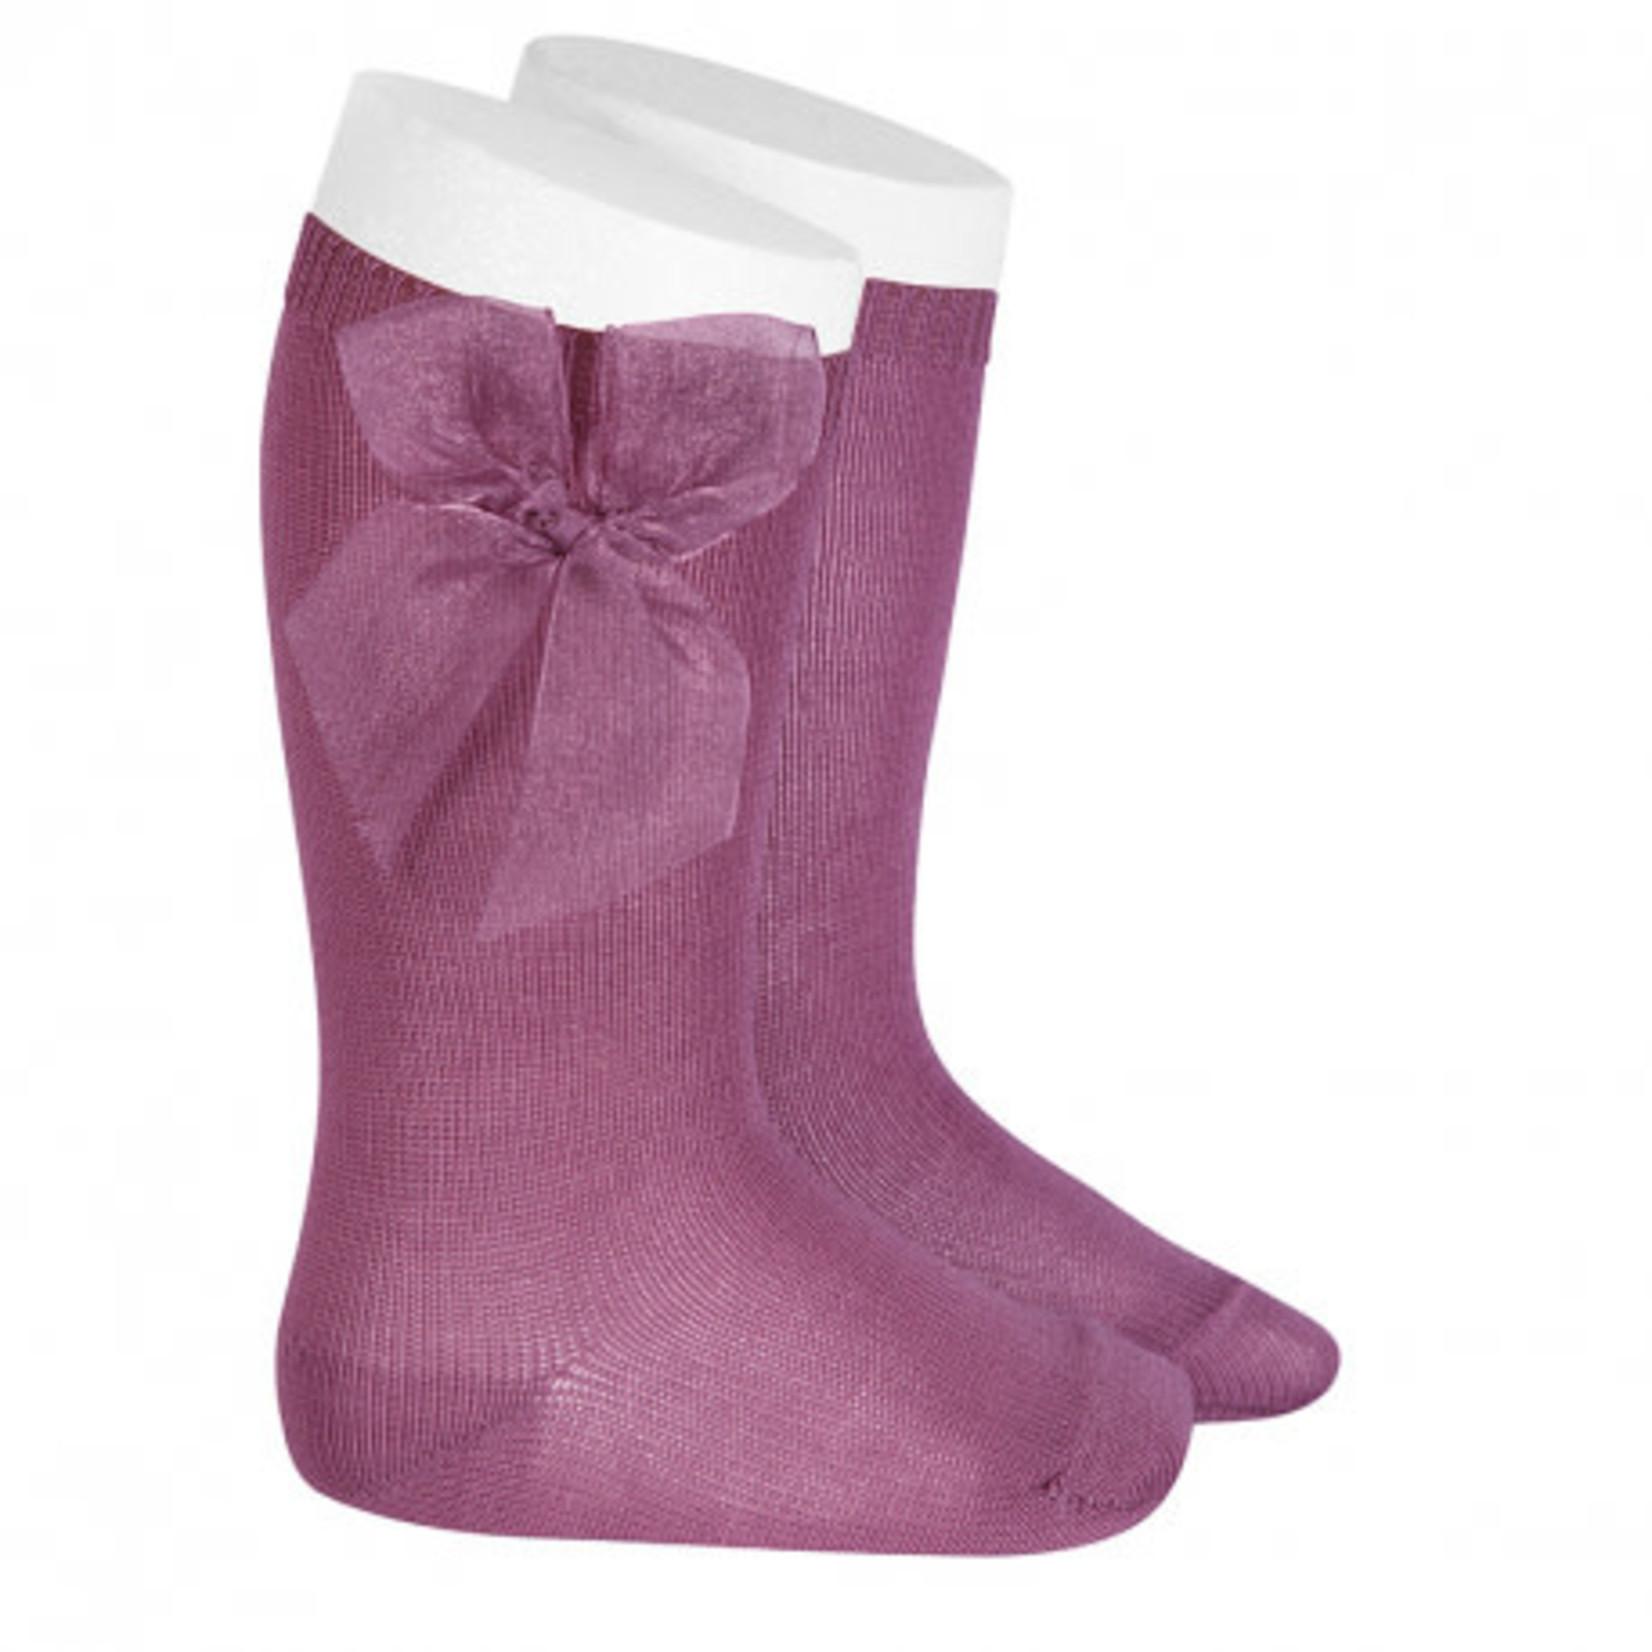 Condor Socks - Cassis